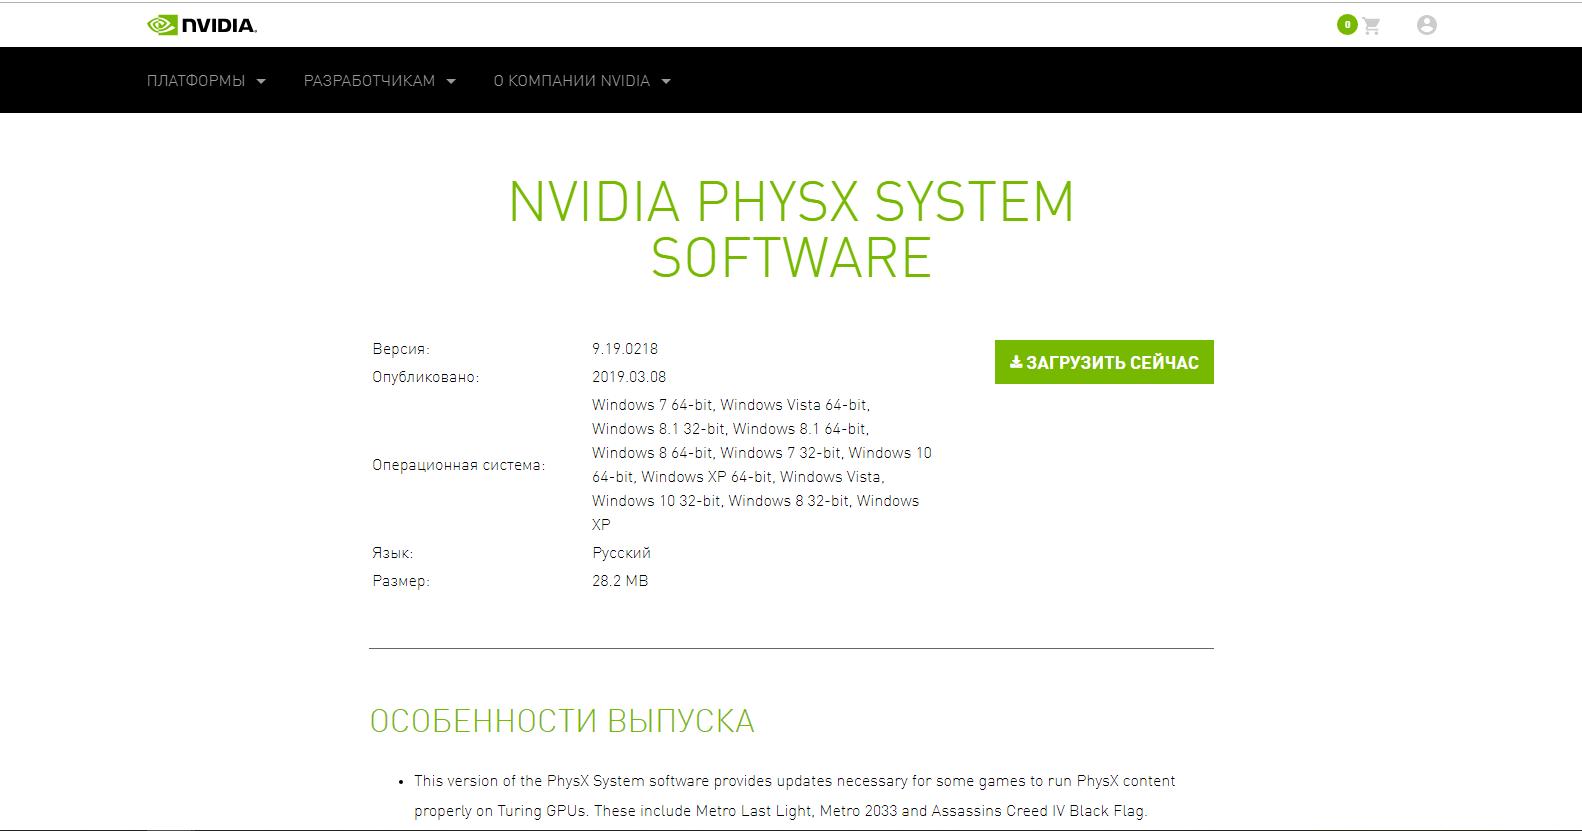 Скачивание пакета PhysX для устранения ошибки